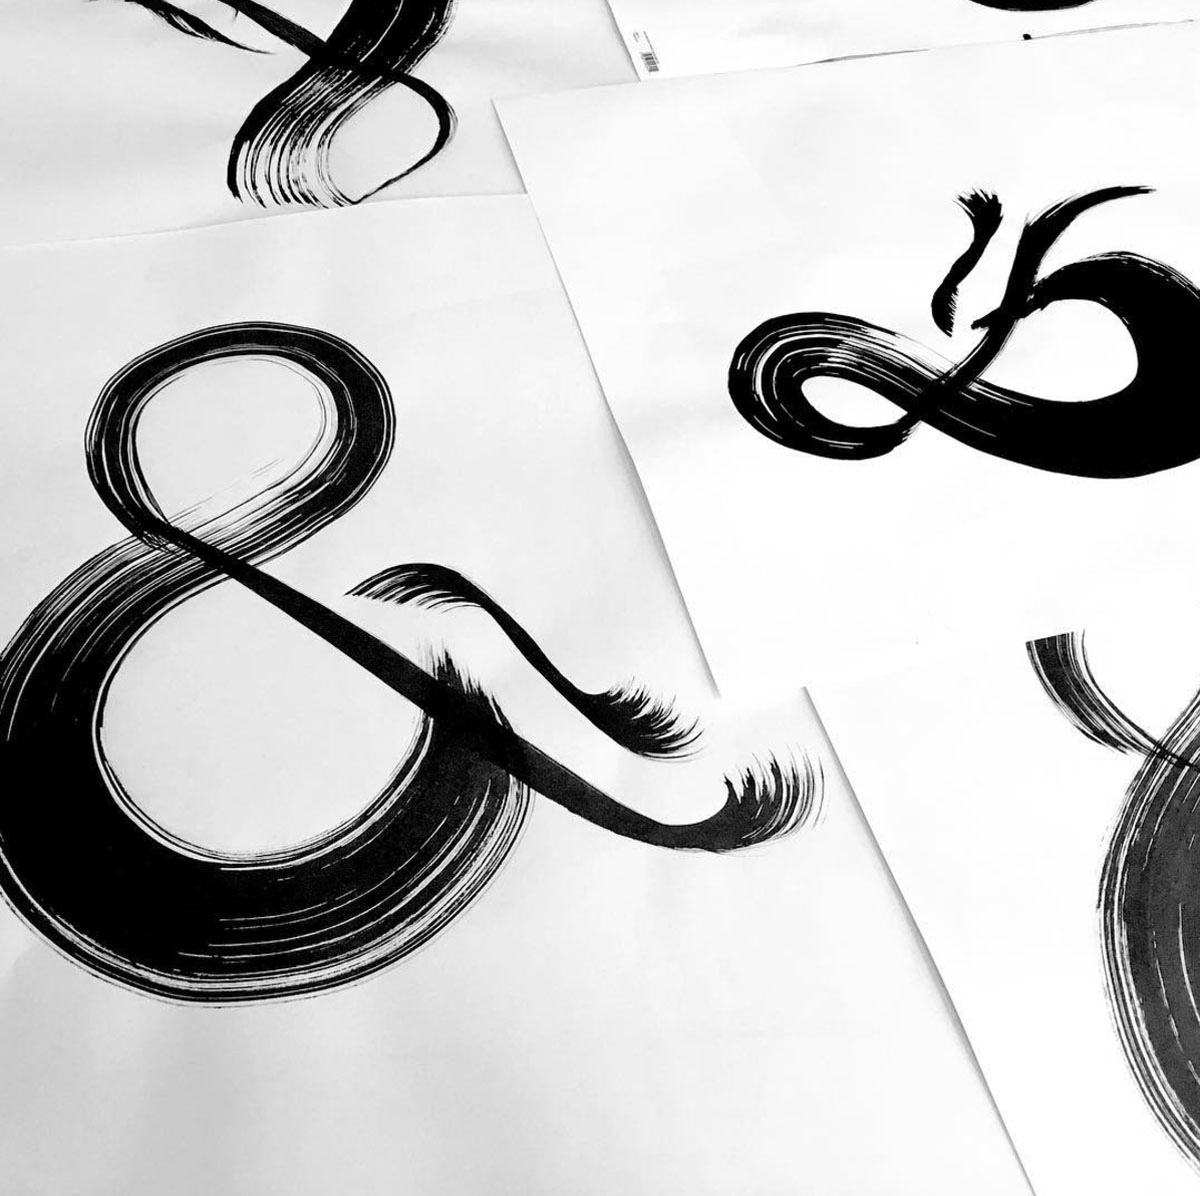 Kelly-Chilton-Calligrafile-15.jpg